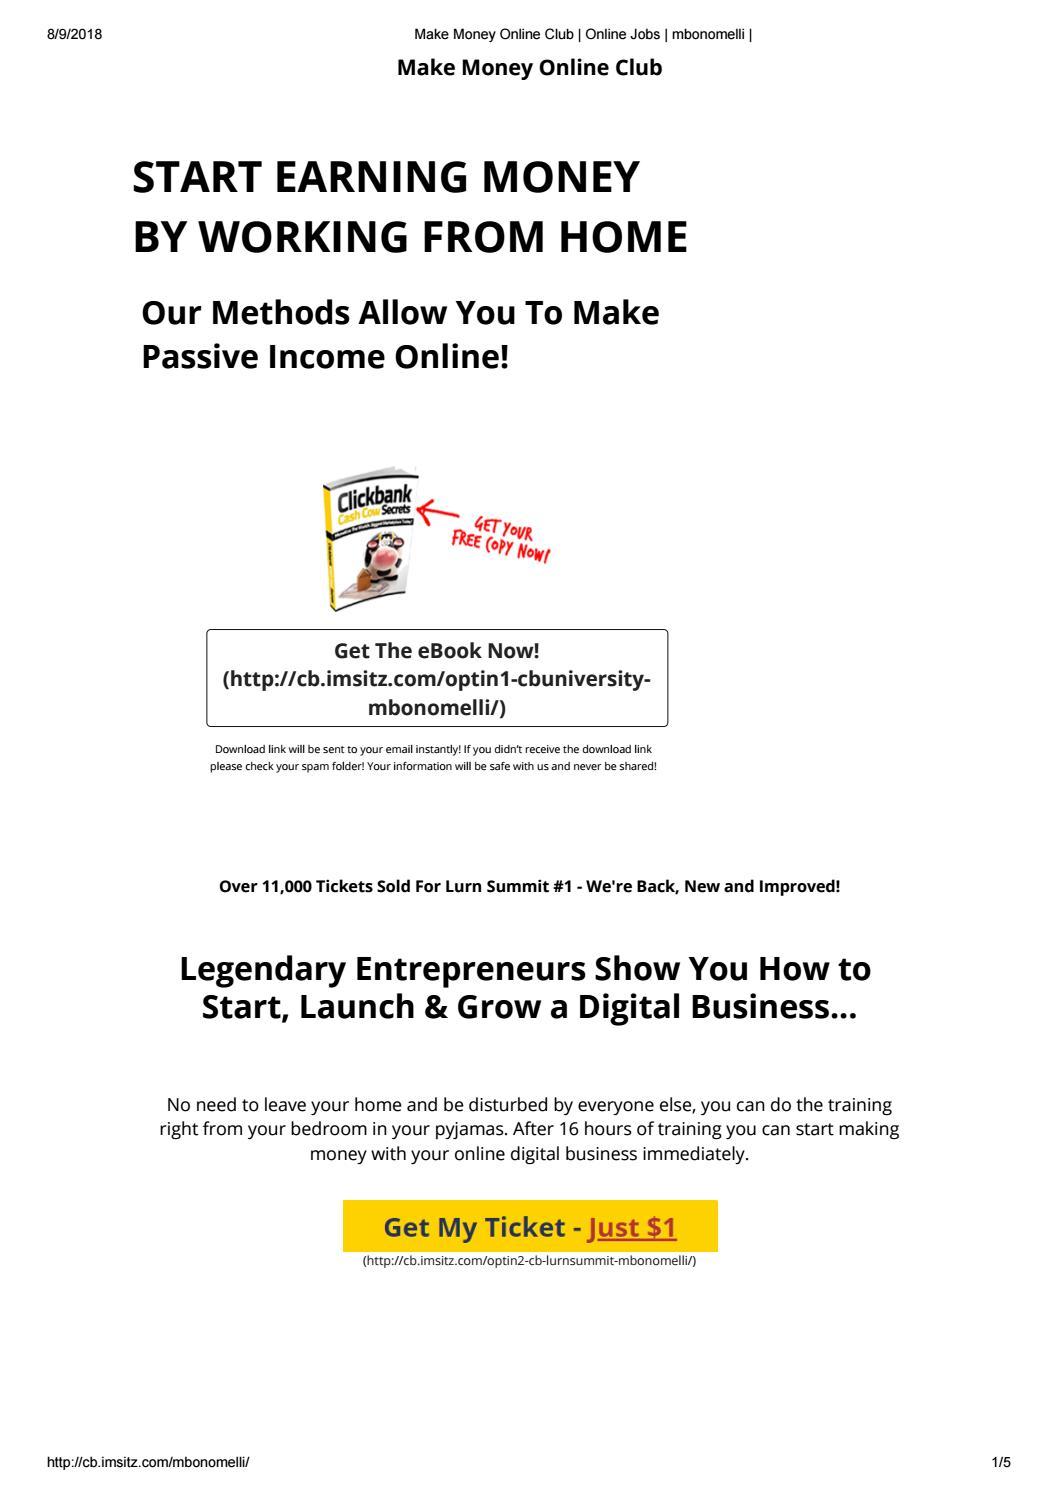 Making money online programs by mmonlineprograms - issuu